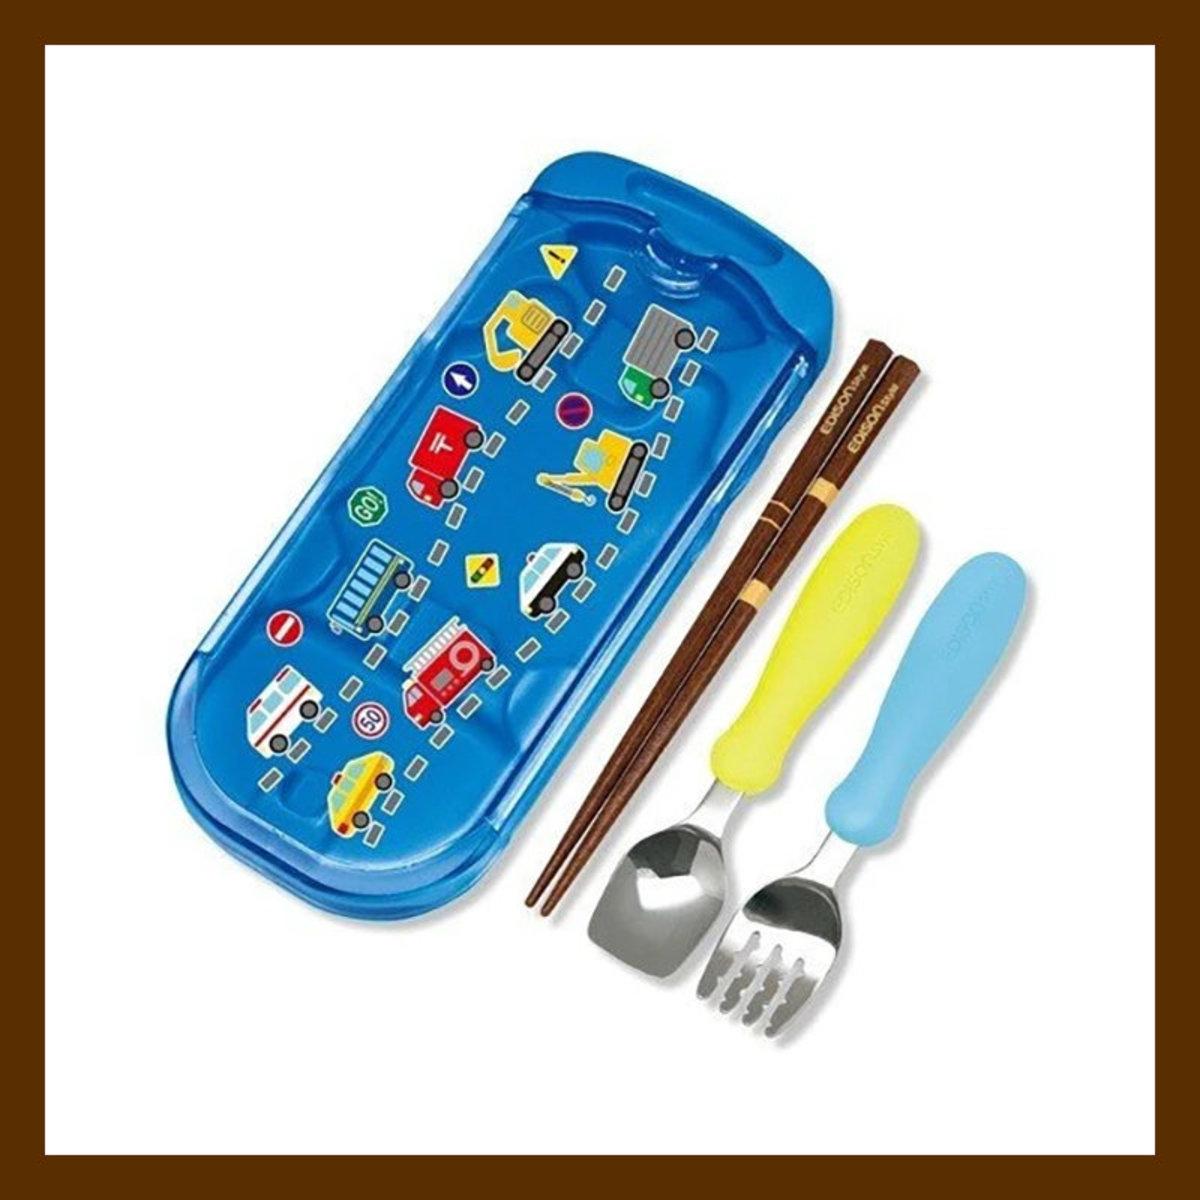 EDISON ma ma 兒童叉匙連筷子套裝  (附收納盒) (藍色)(4544742983178)